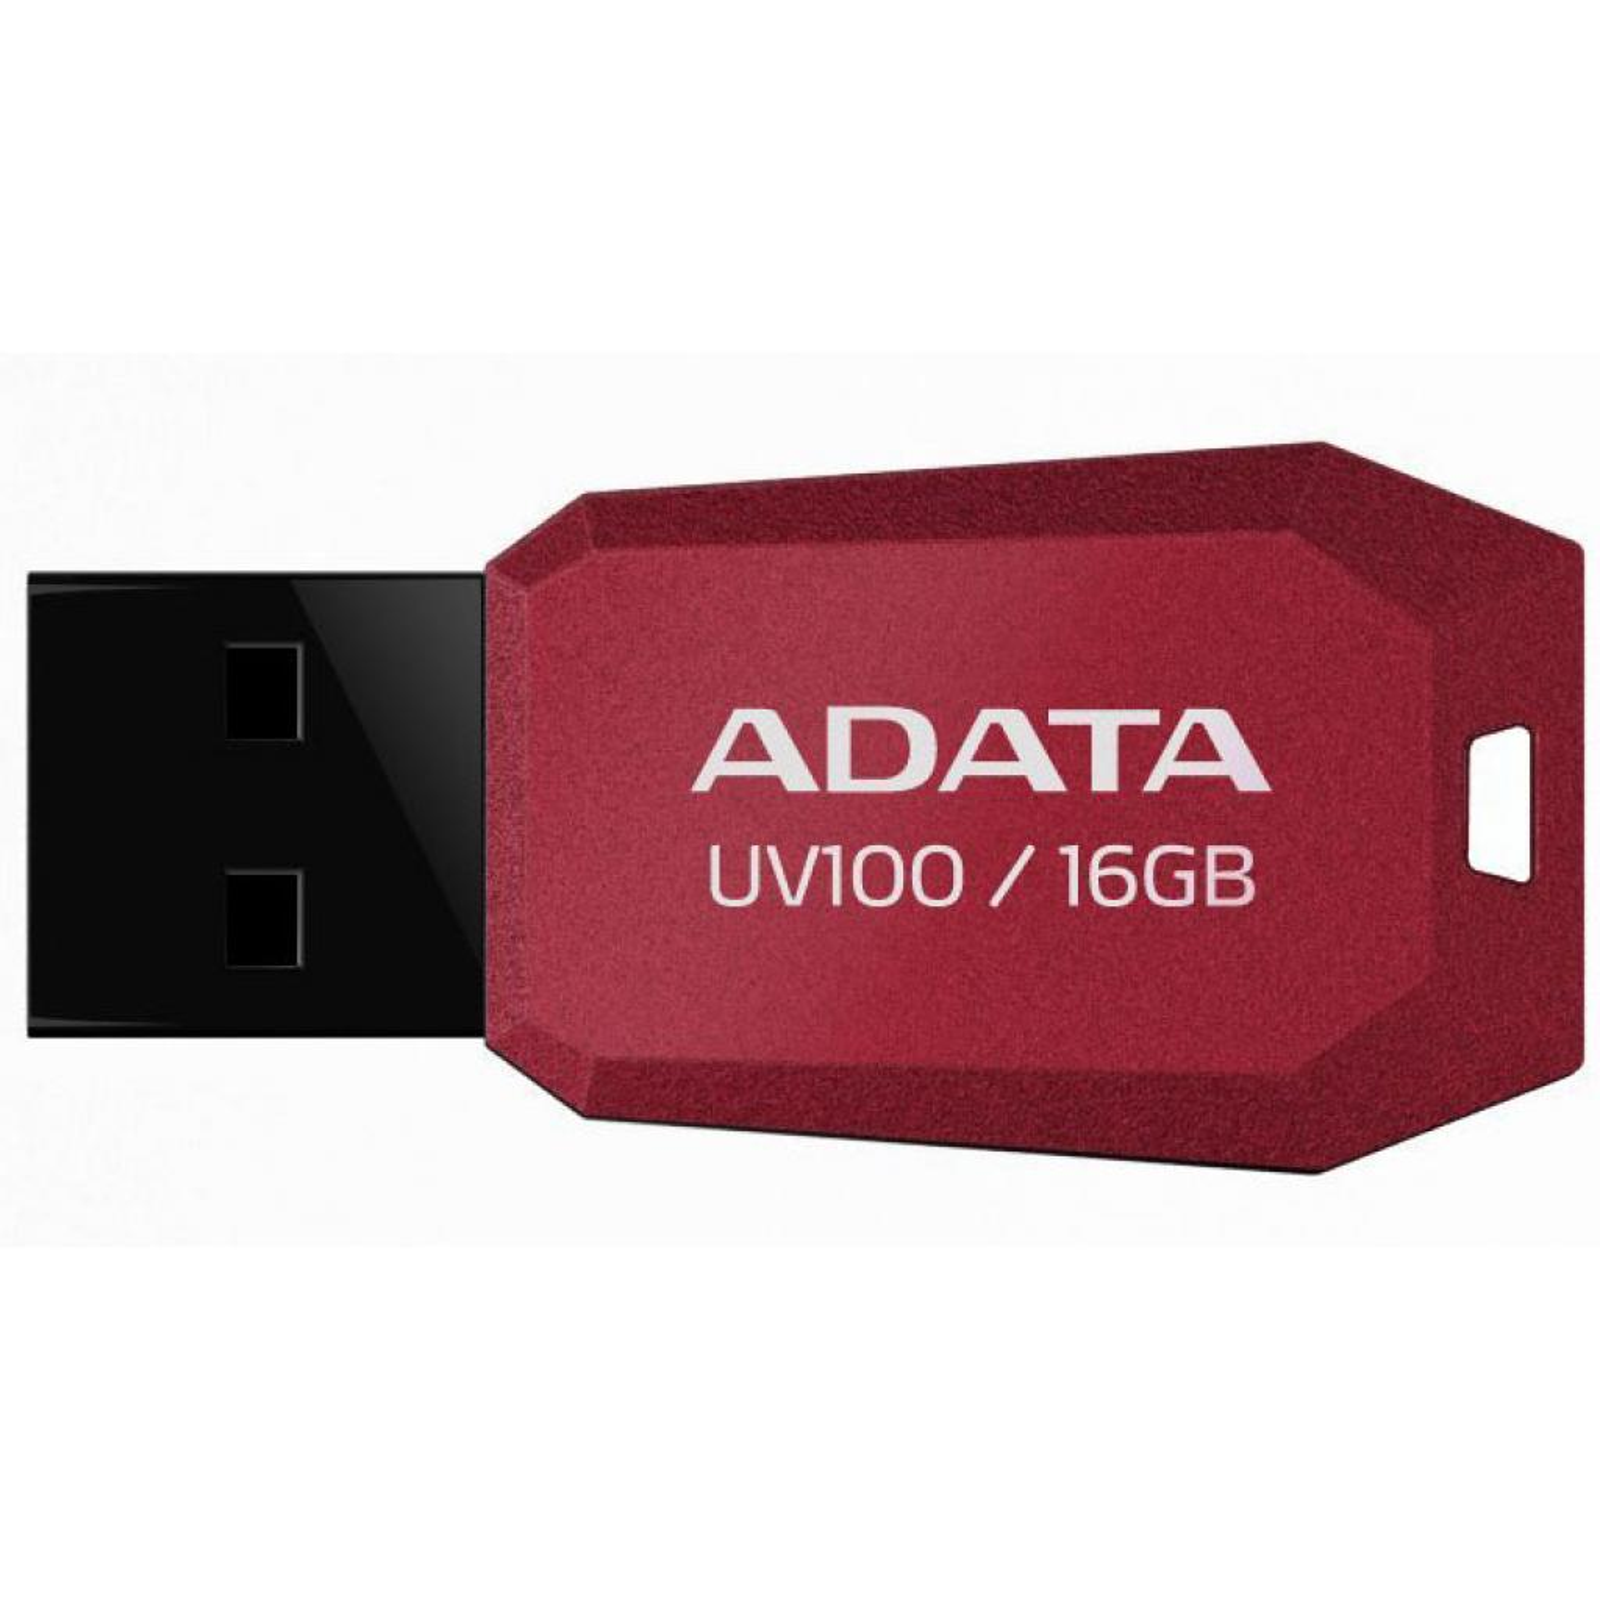 USB флеш накопитель ADATA 32GB DashDrive UV100 Red USB 2.0 (AUV100-32G-RRD)